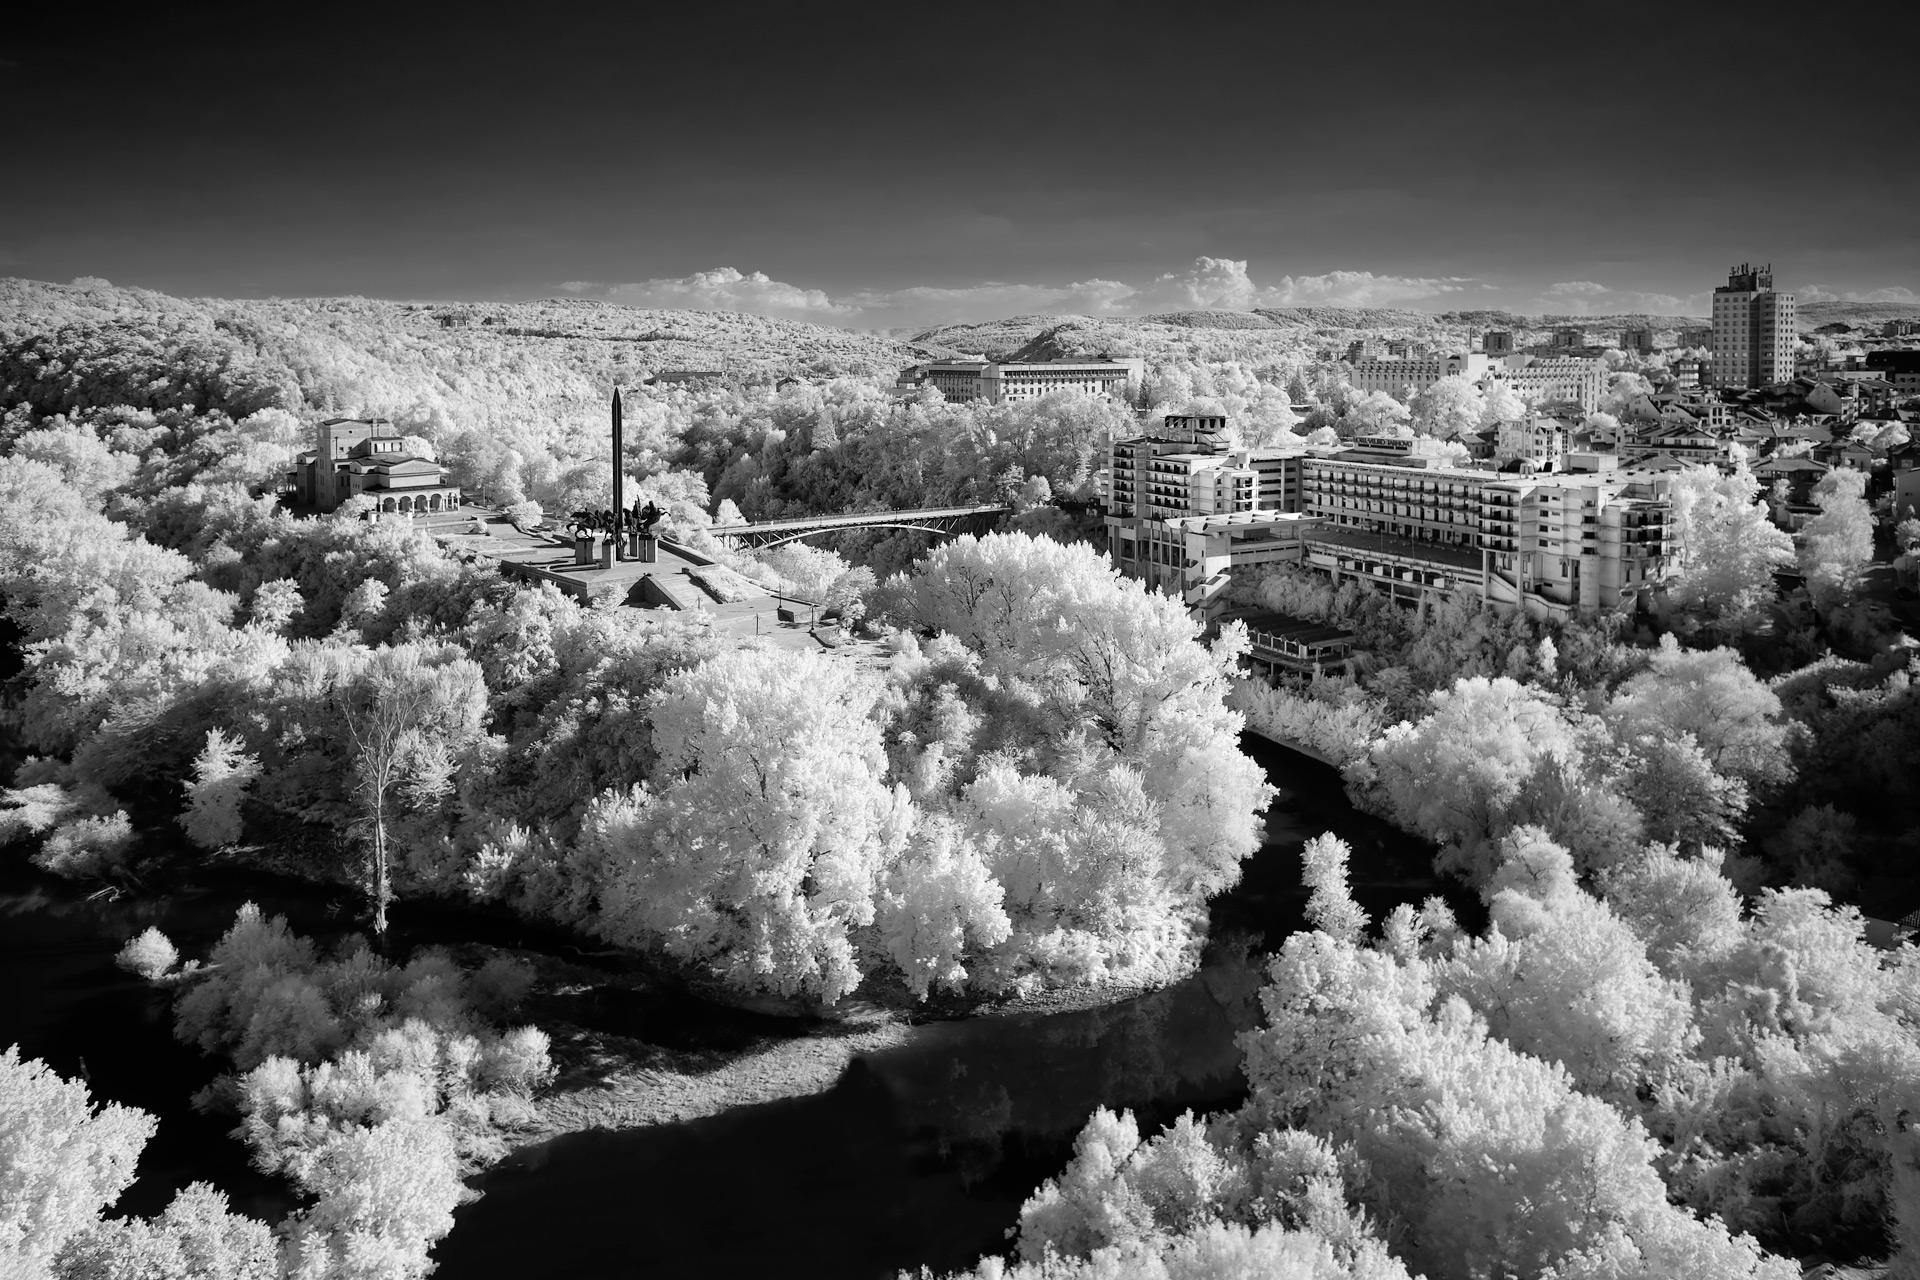 Veliko Turnovo, Bulgaria (IR) / Show the Original, Landscape Photography, Infrared, Fujinon XF 14mm f/2.8, Fujifilm X-E2, Bulgaria [veliko turnovo bulgaria ir f]